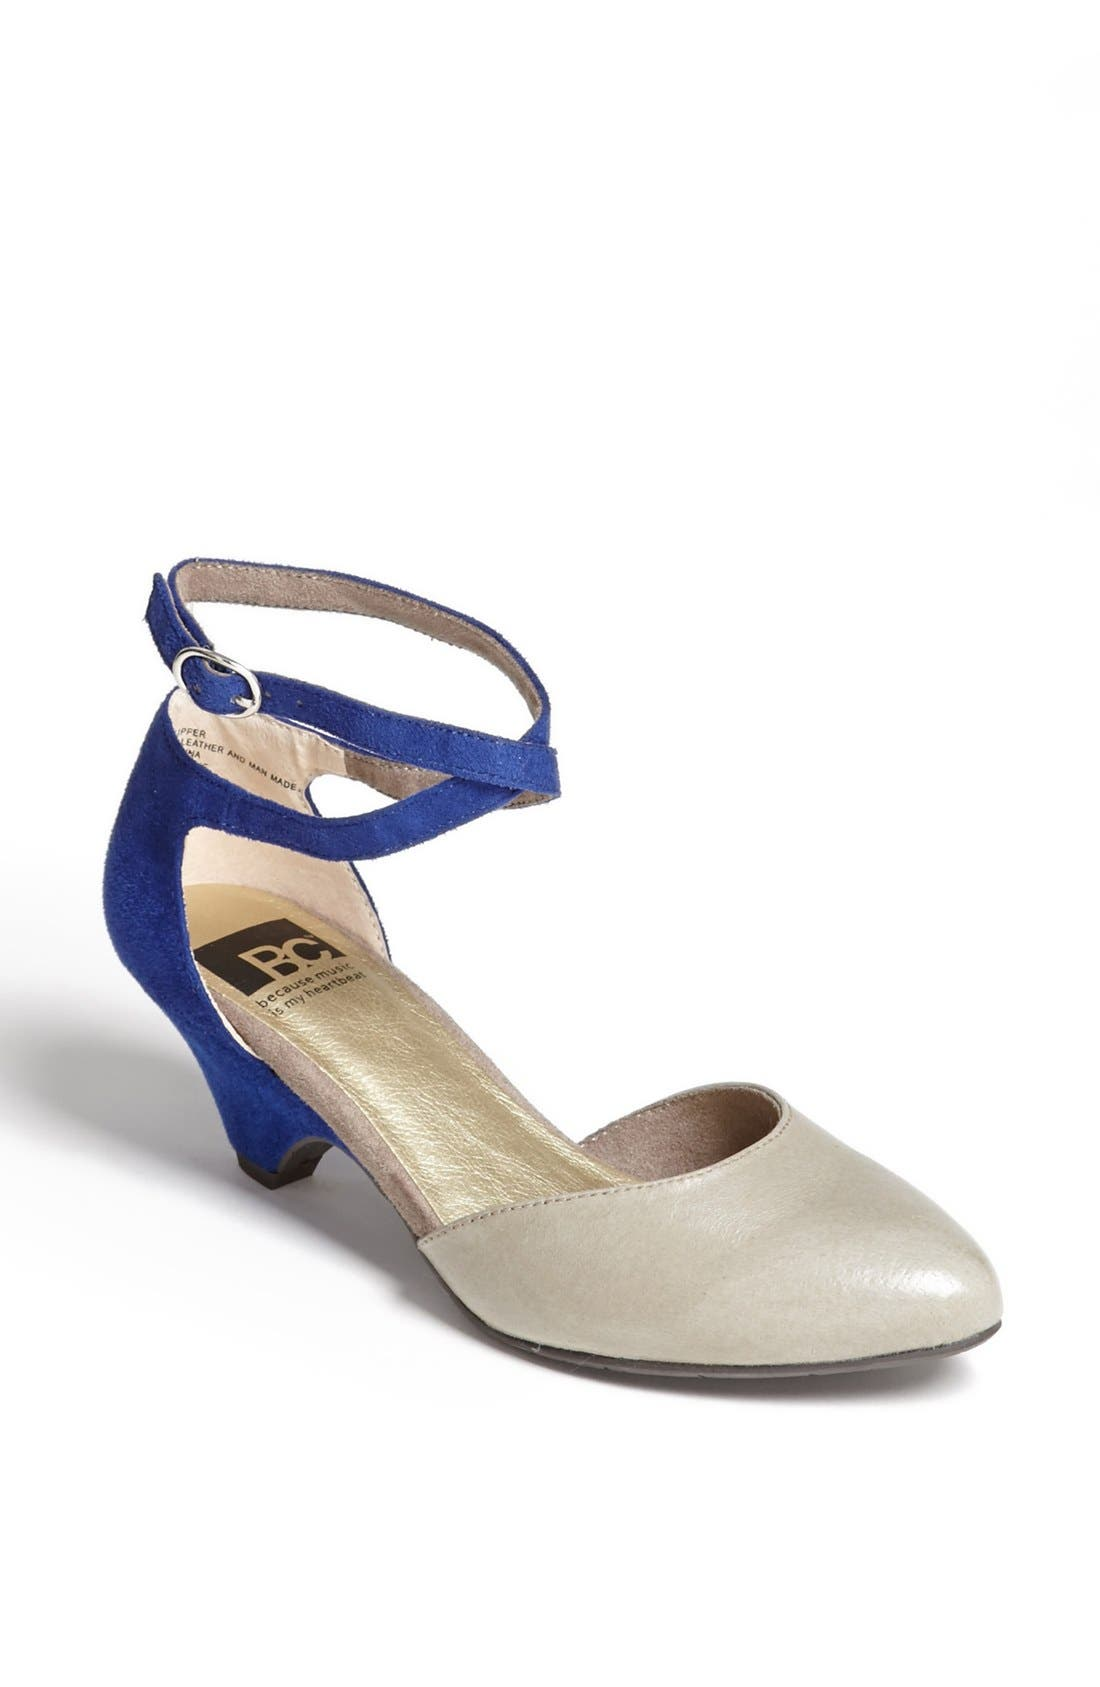 Alternate Image 1 Selected - BC Footwear 'Burn Brighter' Pump